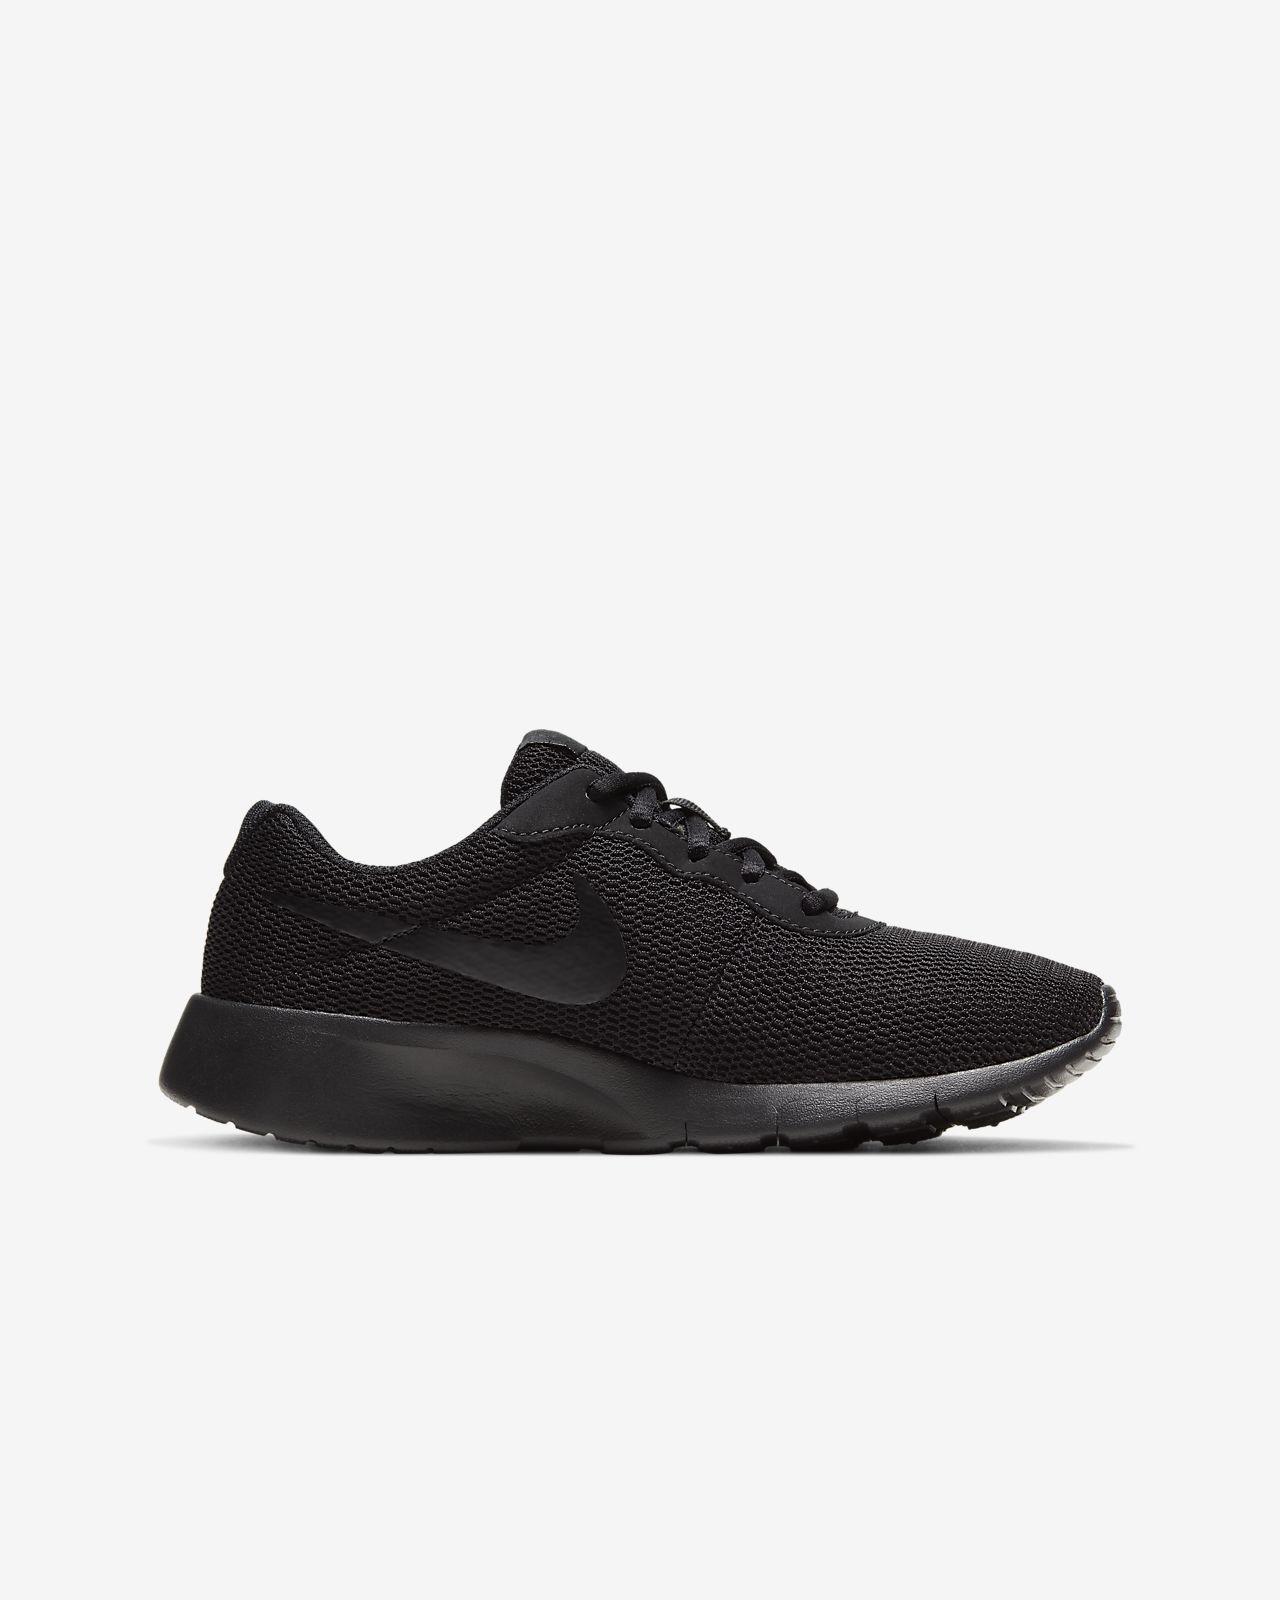 Nike Tanjun Dance Shoes For Girls Black